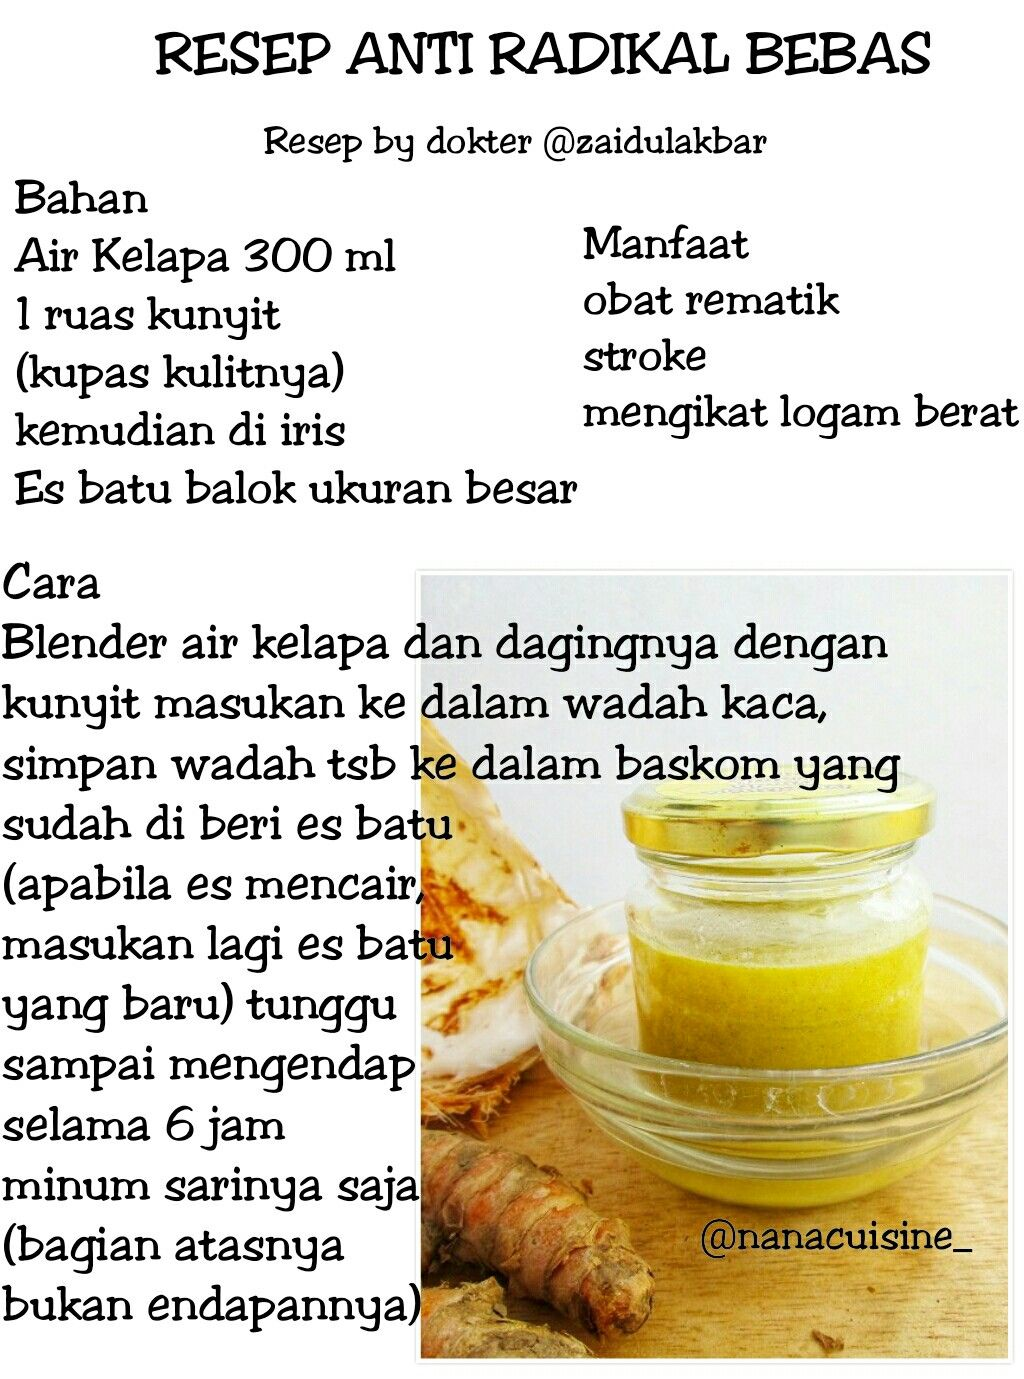 Pin Oleh Long Di Resep Jsr Diet Detoks Resep Diet Sehat Resep Diet